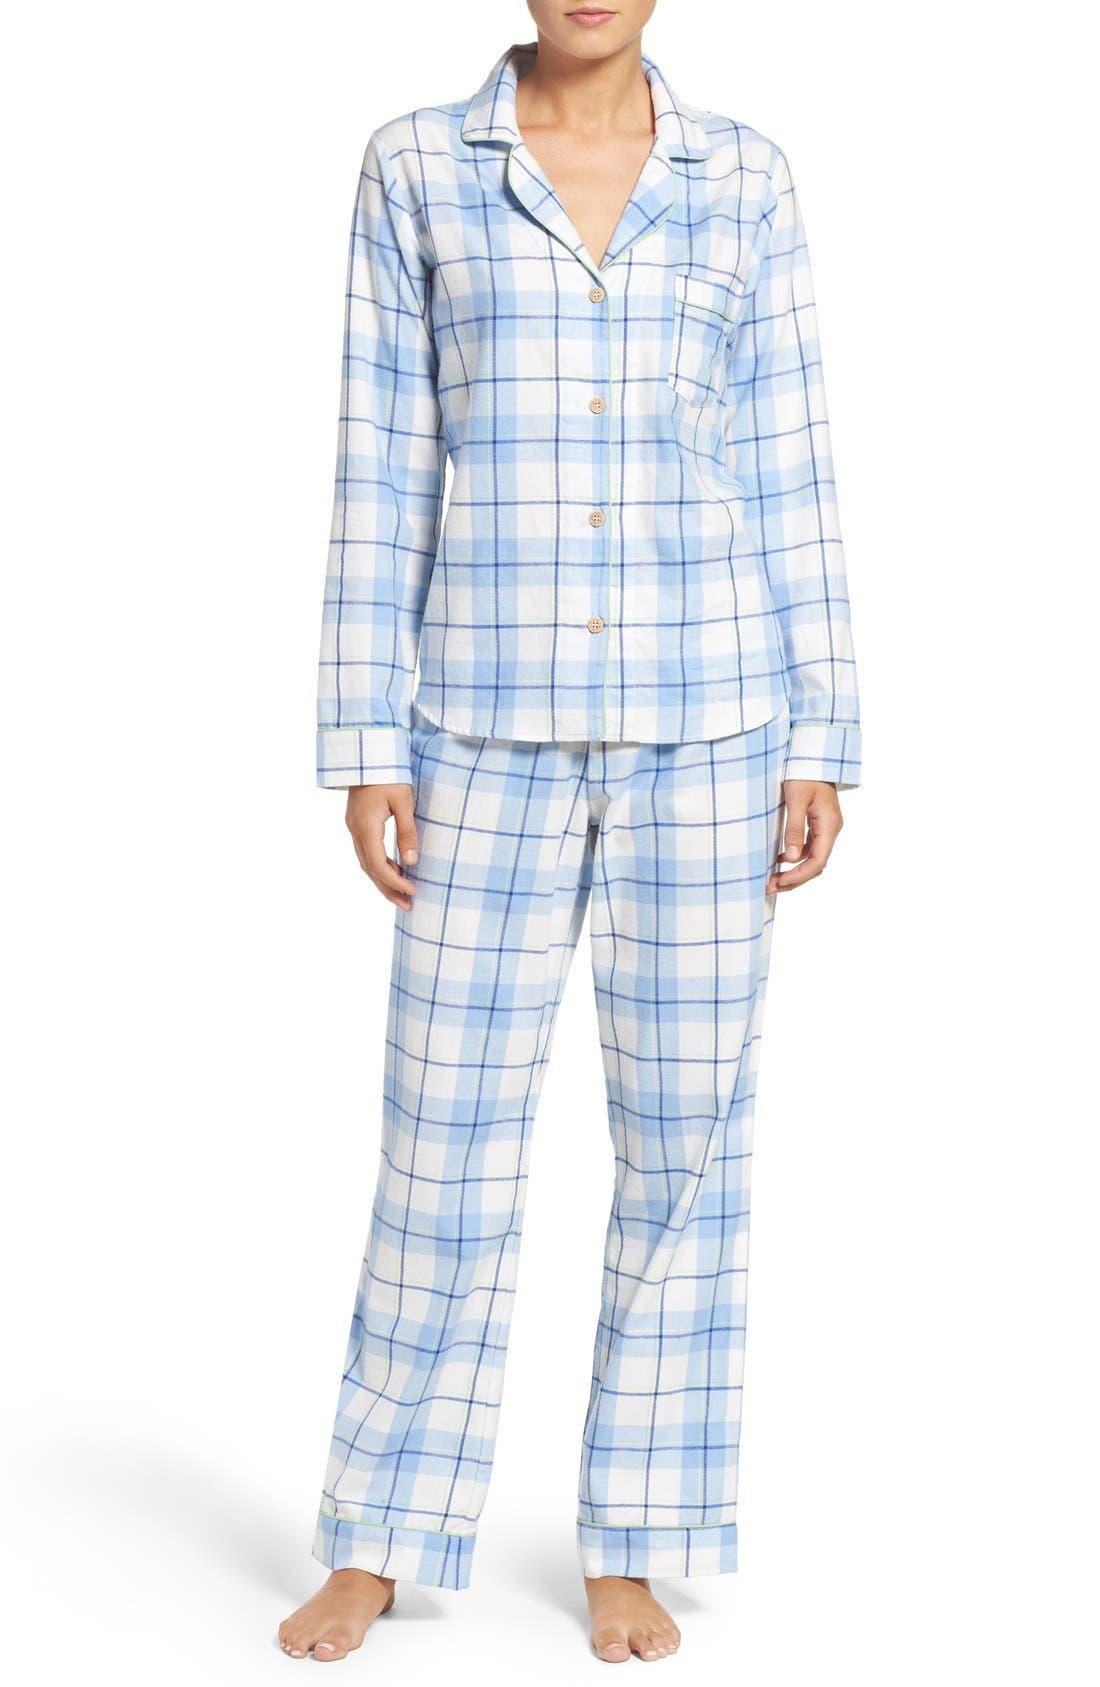 Alternate Image 1 Selected - UGG® 'Raven' Plaid Cotton Pajamas